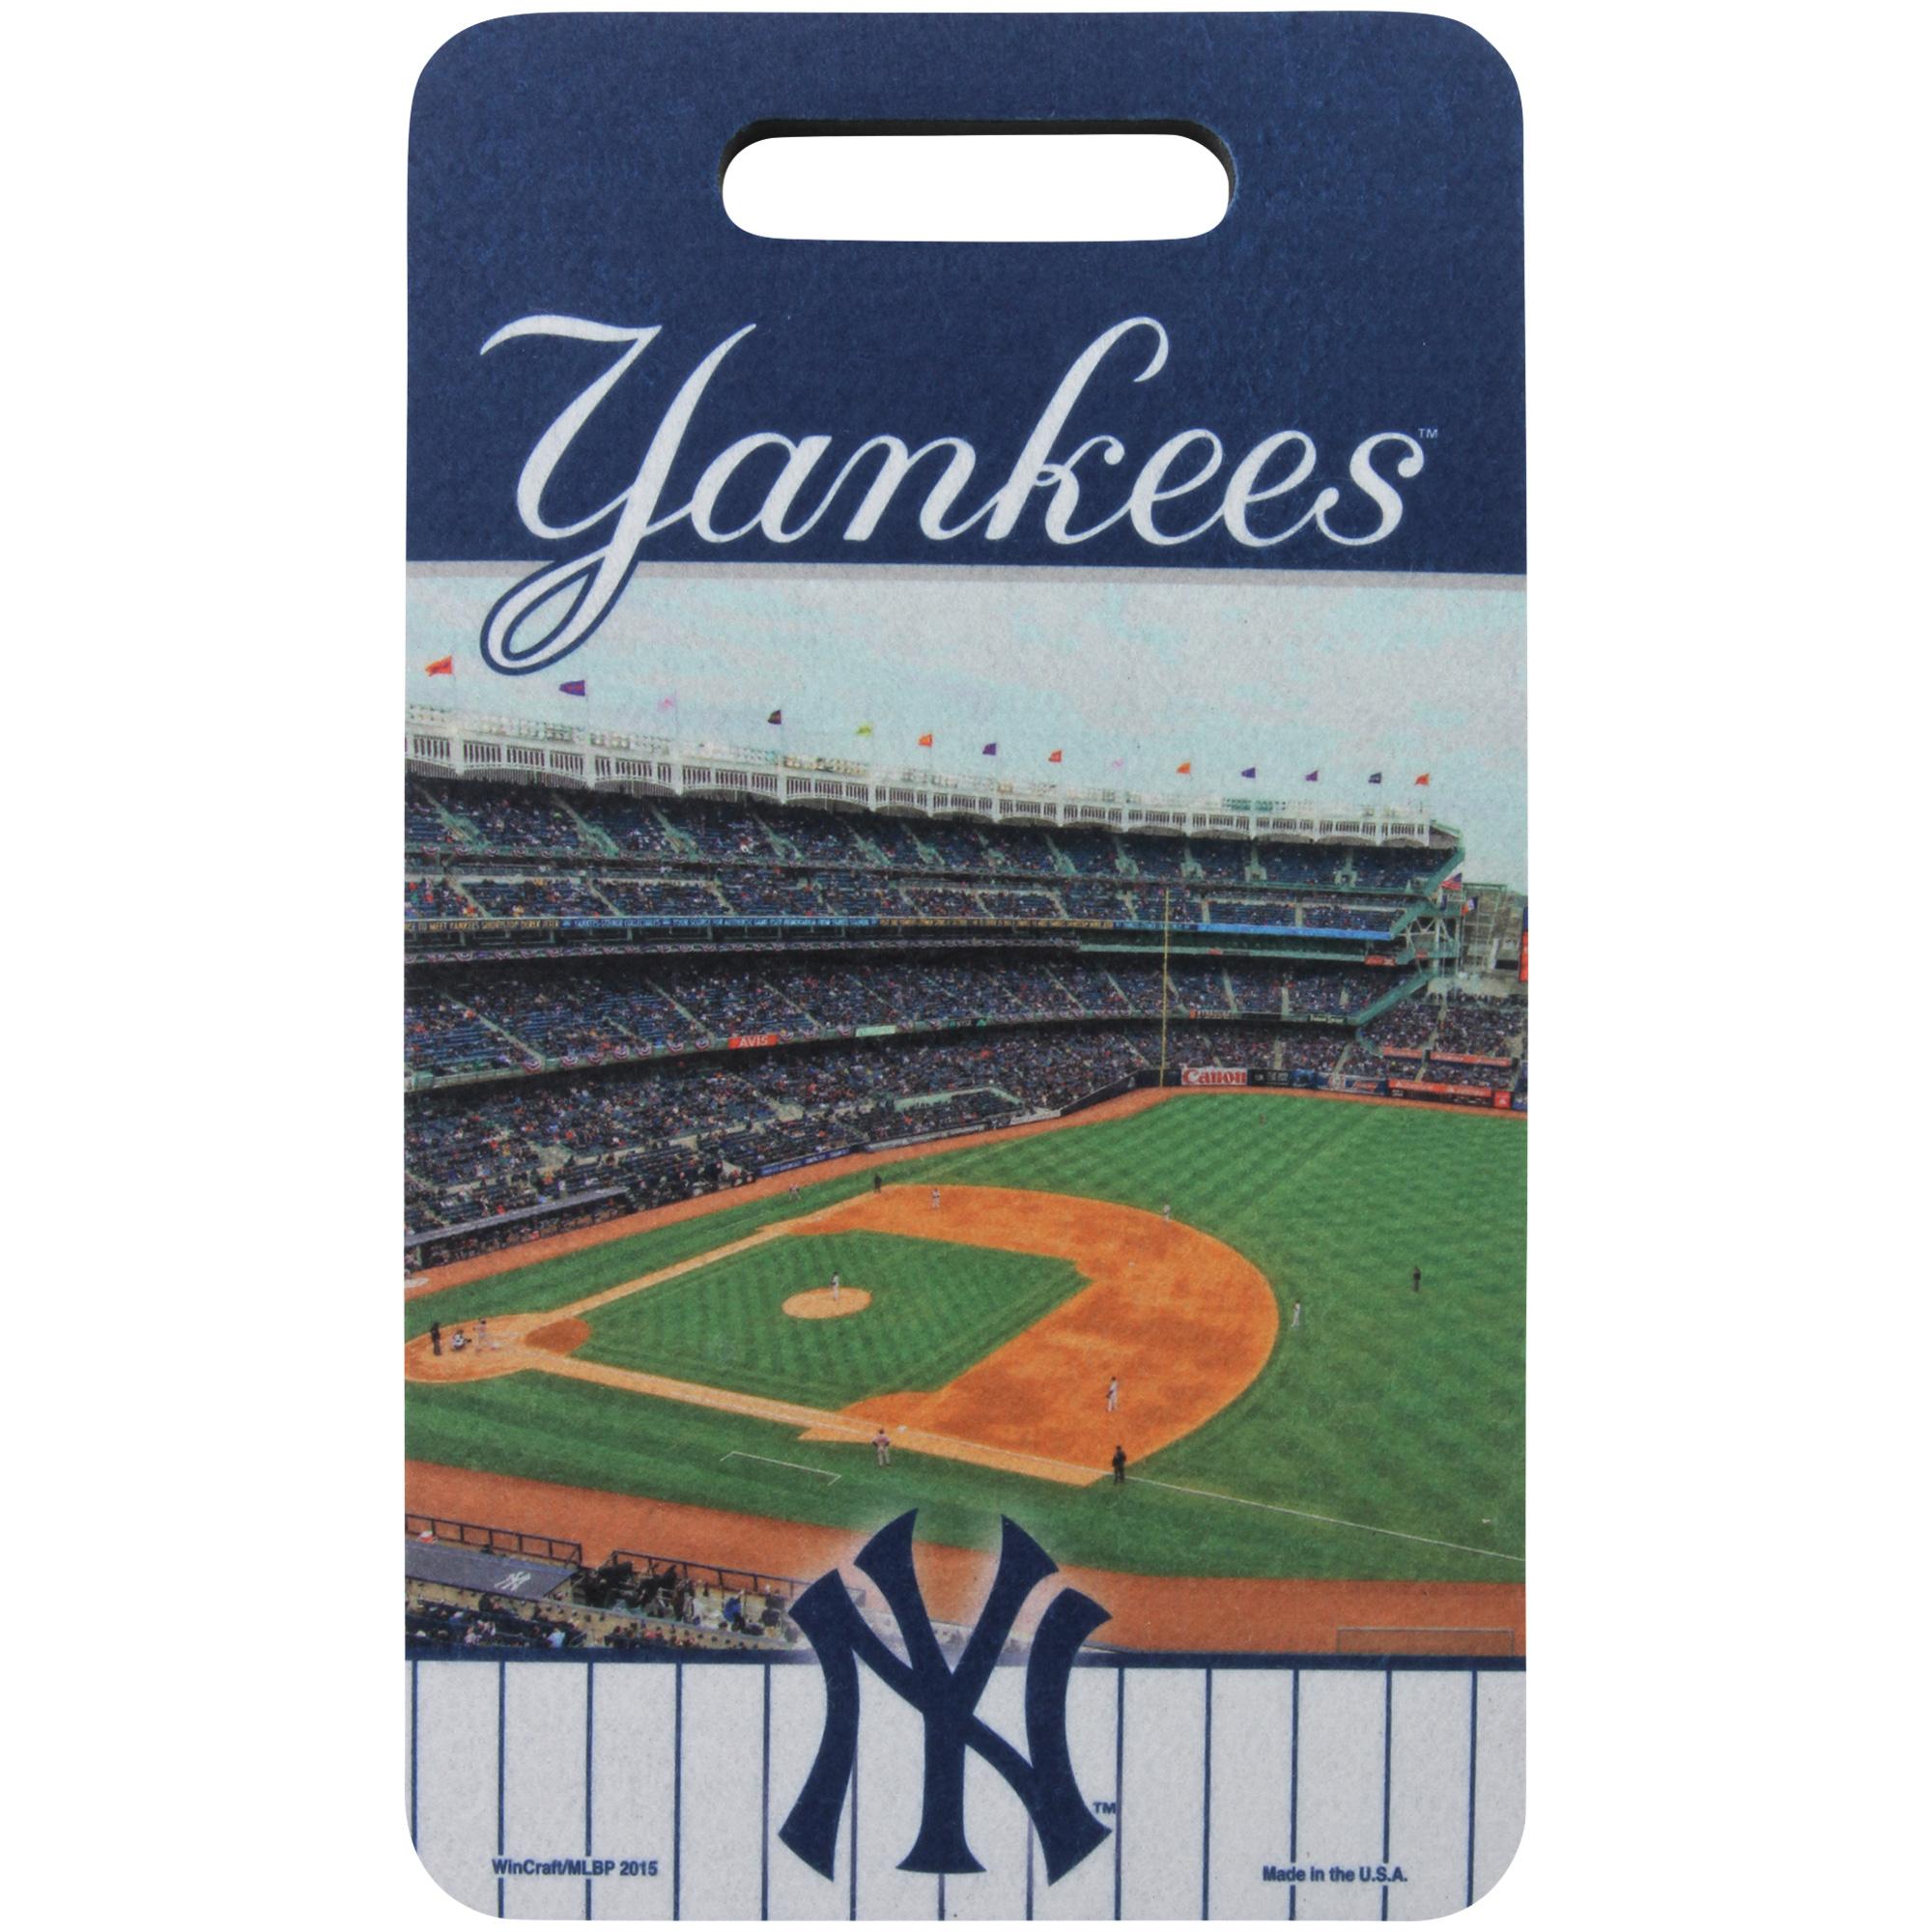 "New York Yankees WinCraft 10"" x 17"" Stadium Seat Cushion - No Size"